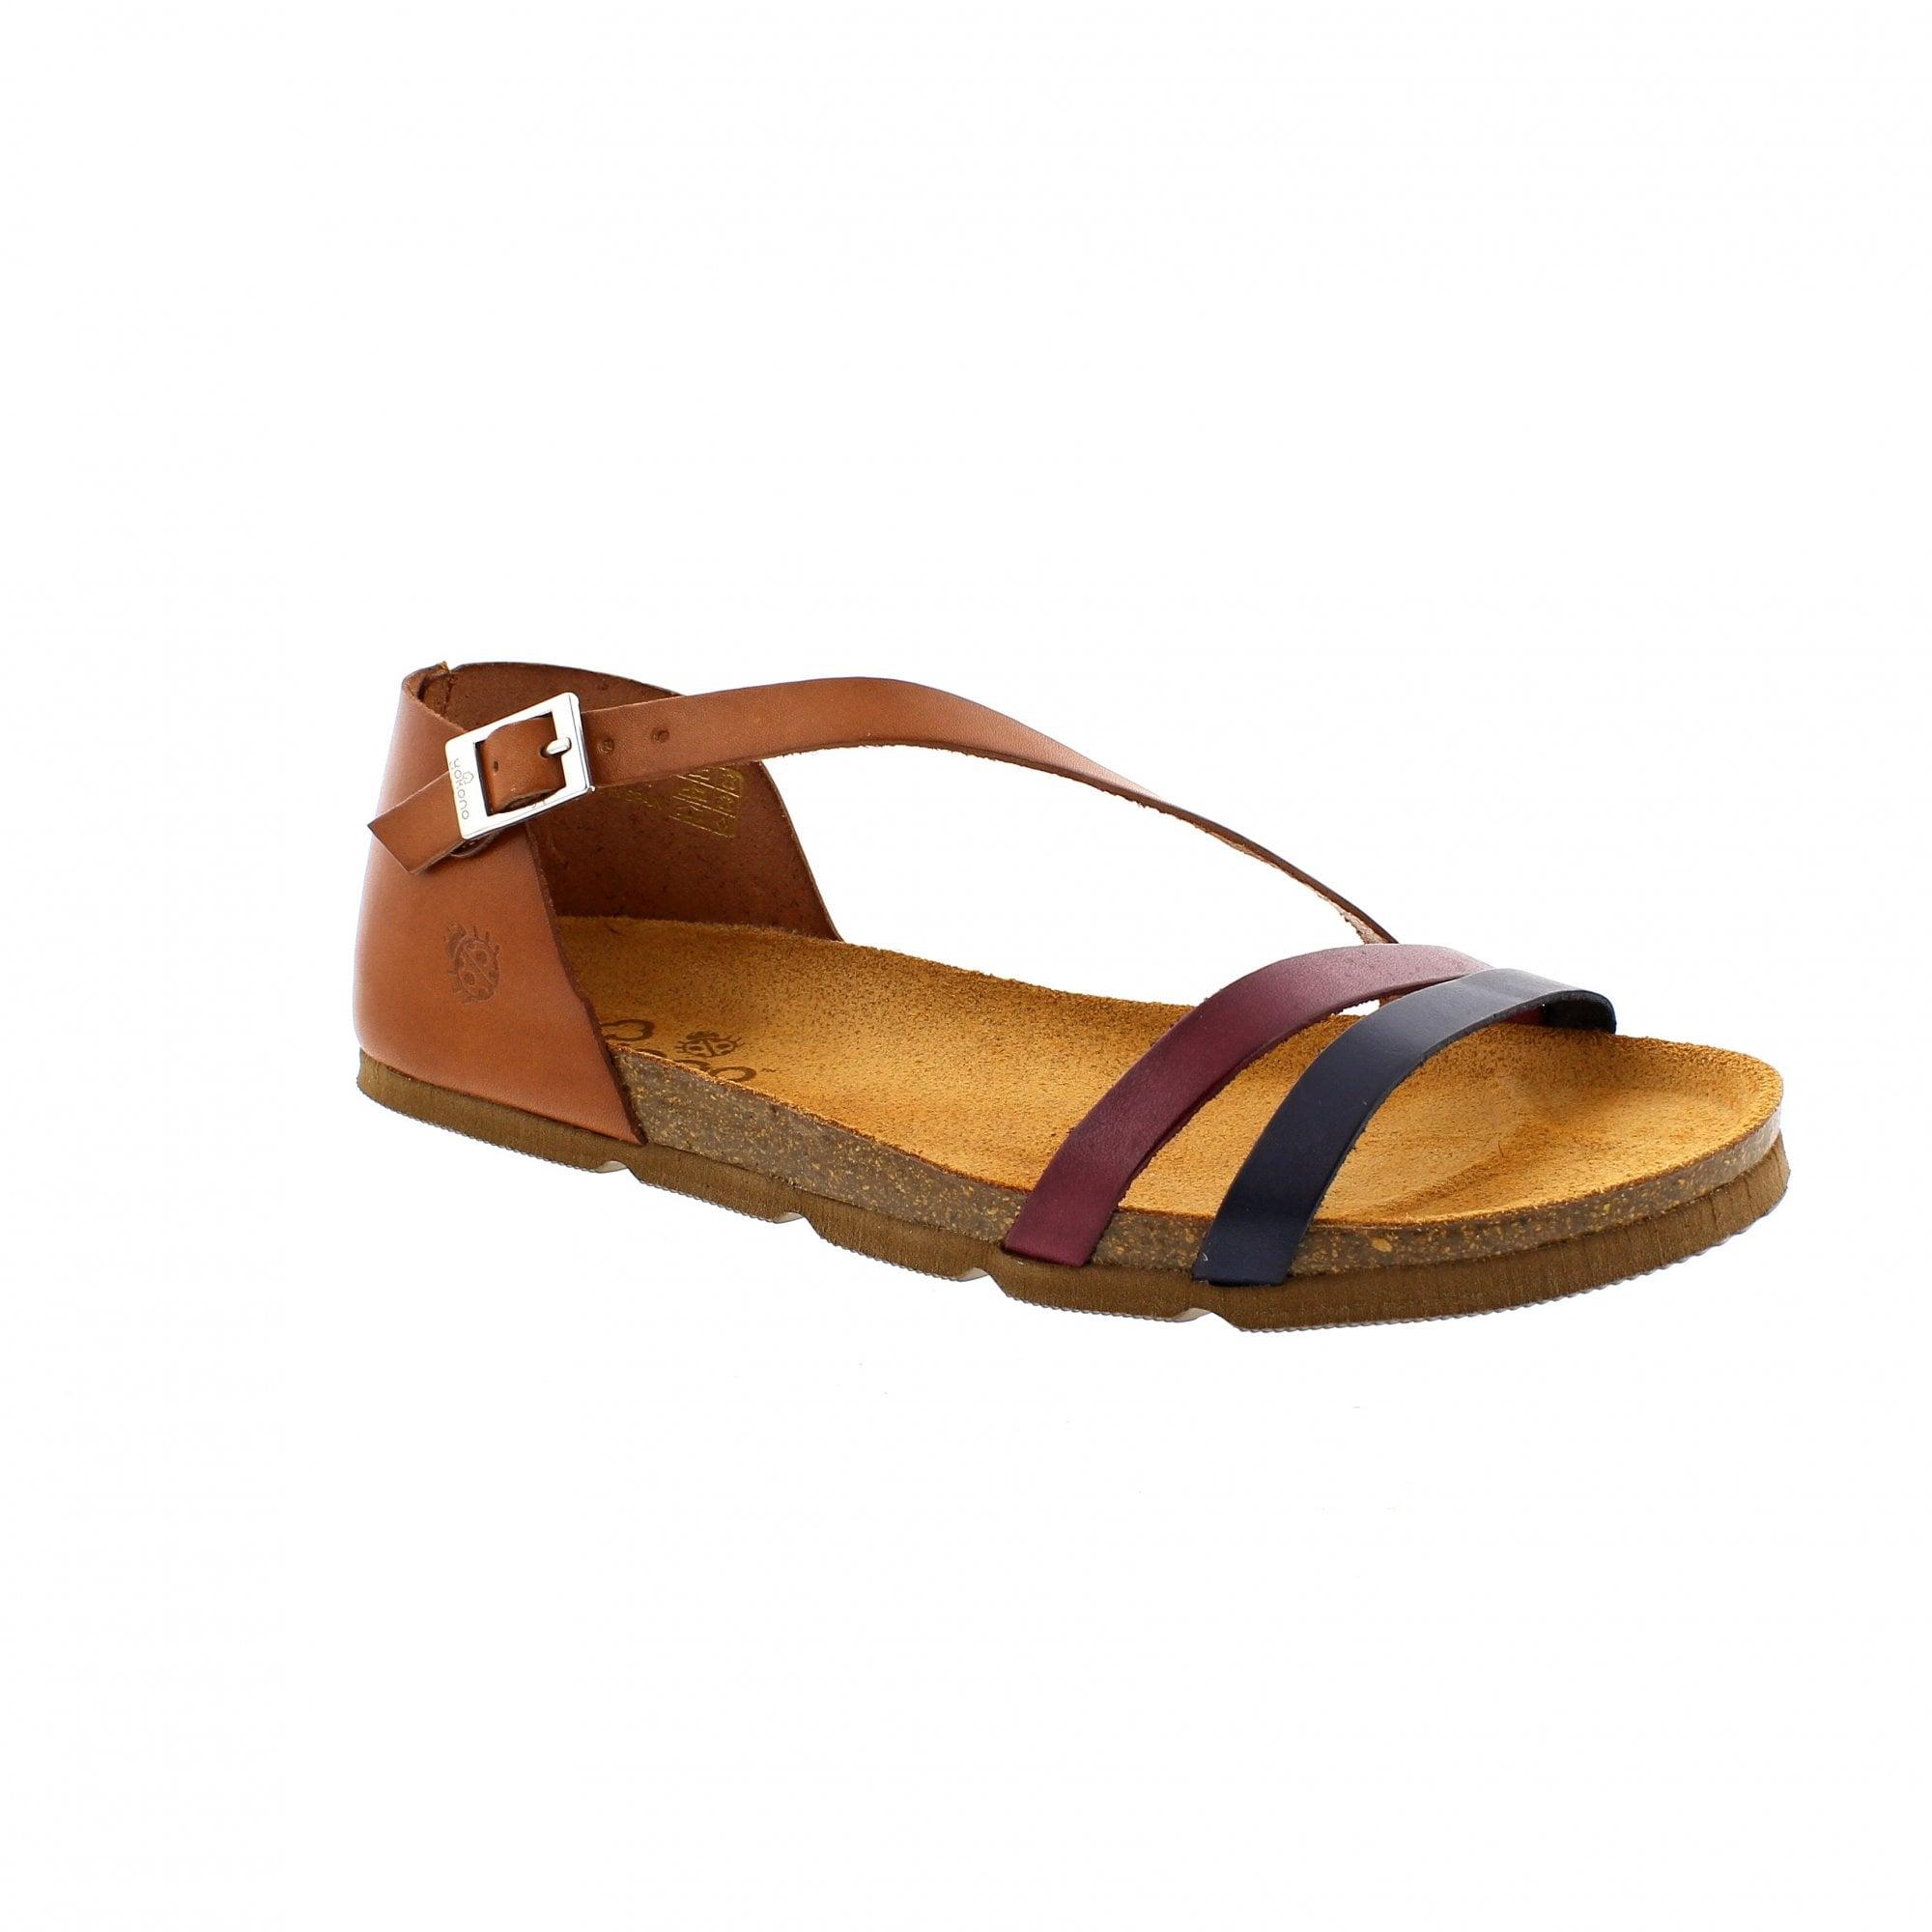 Yokono Villa 057 Womens Sandals Tan